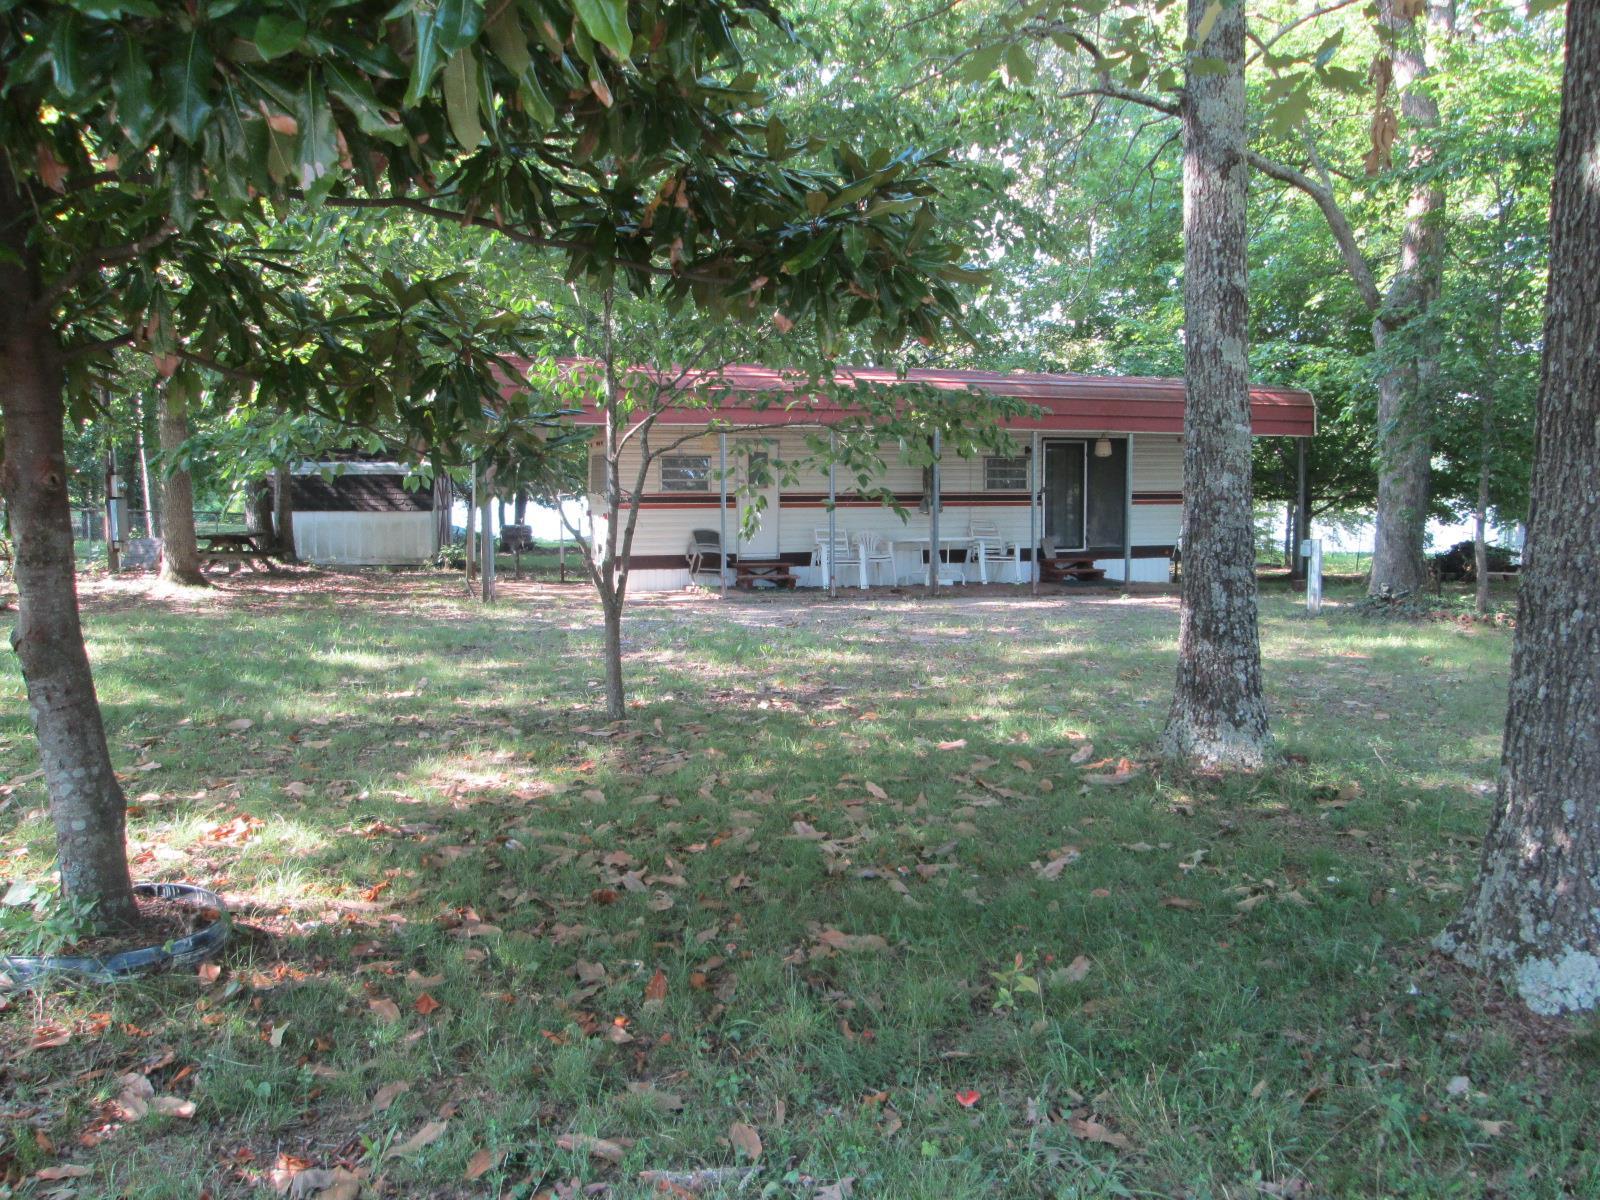 0 Parker Pt, Beechgrove, TN 37018 - Beechgrove, TN real estate listing